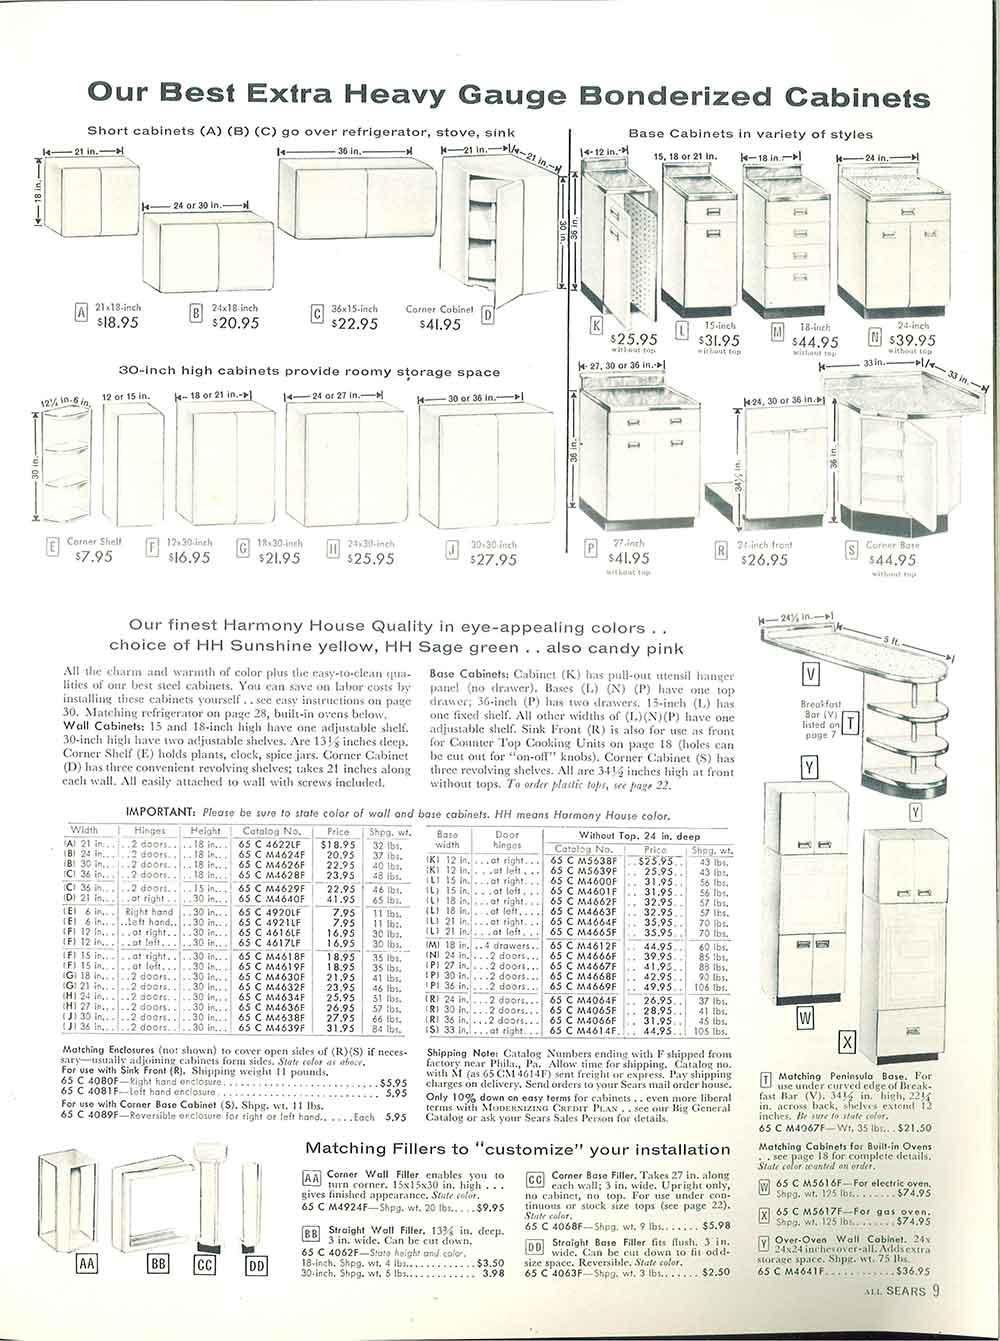 kitchen cabinet catalog sears kitchen cabinets Sears Kitchen Cabinetore 32 Page Catalog Retro Ikea Kitchen Cabinet Catalog